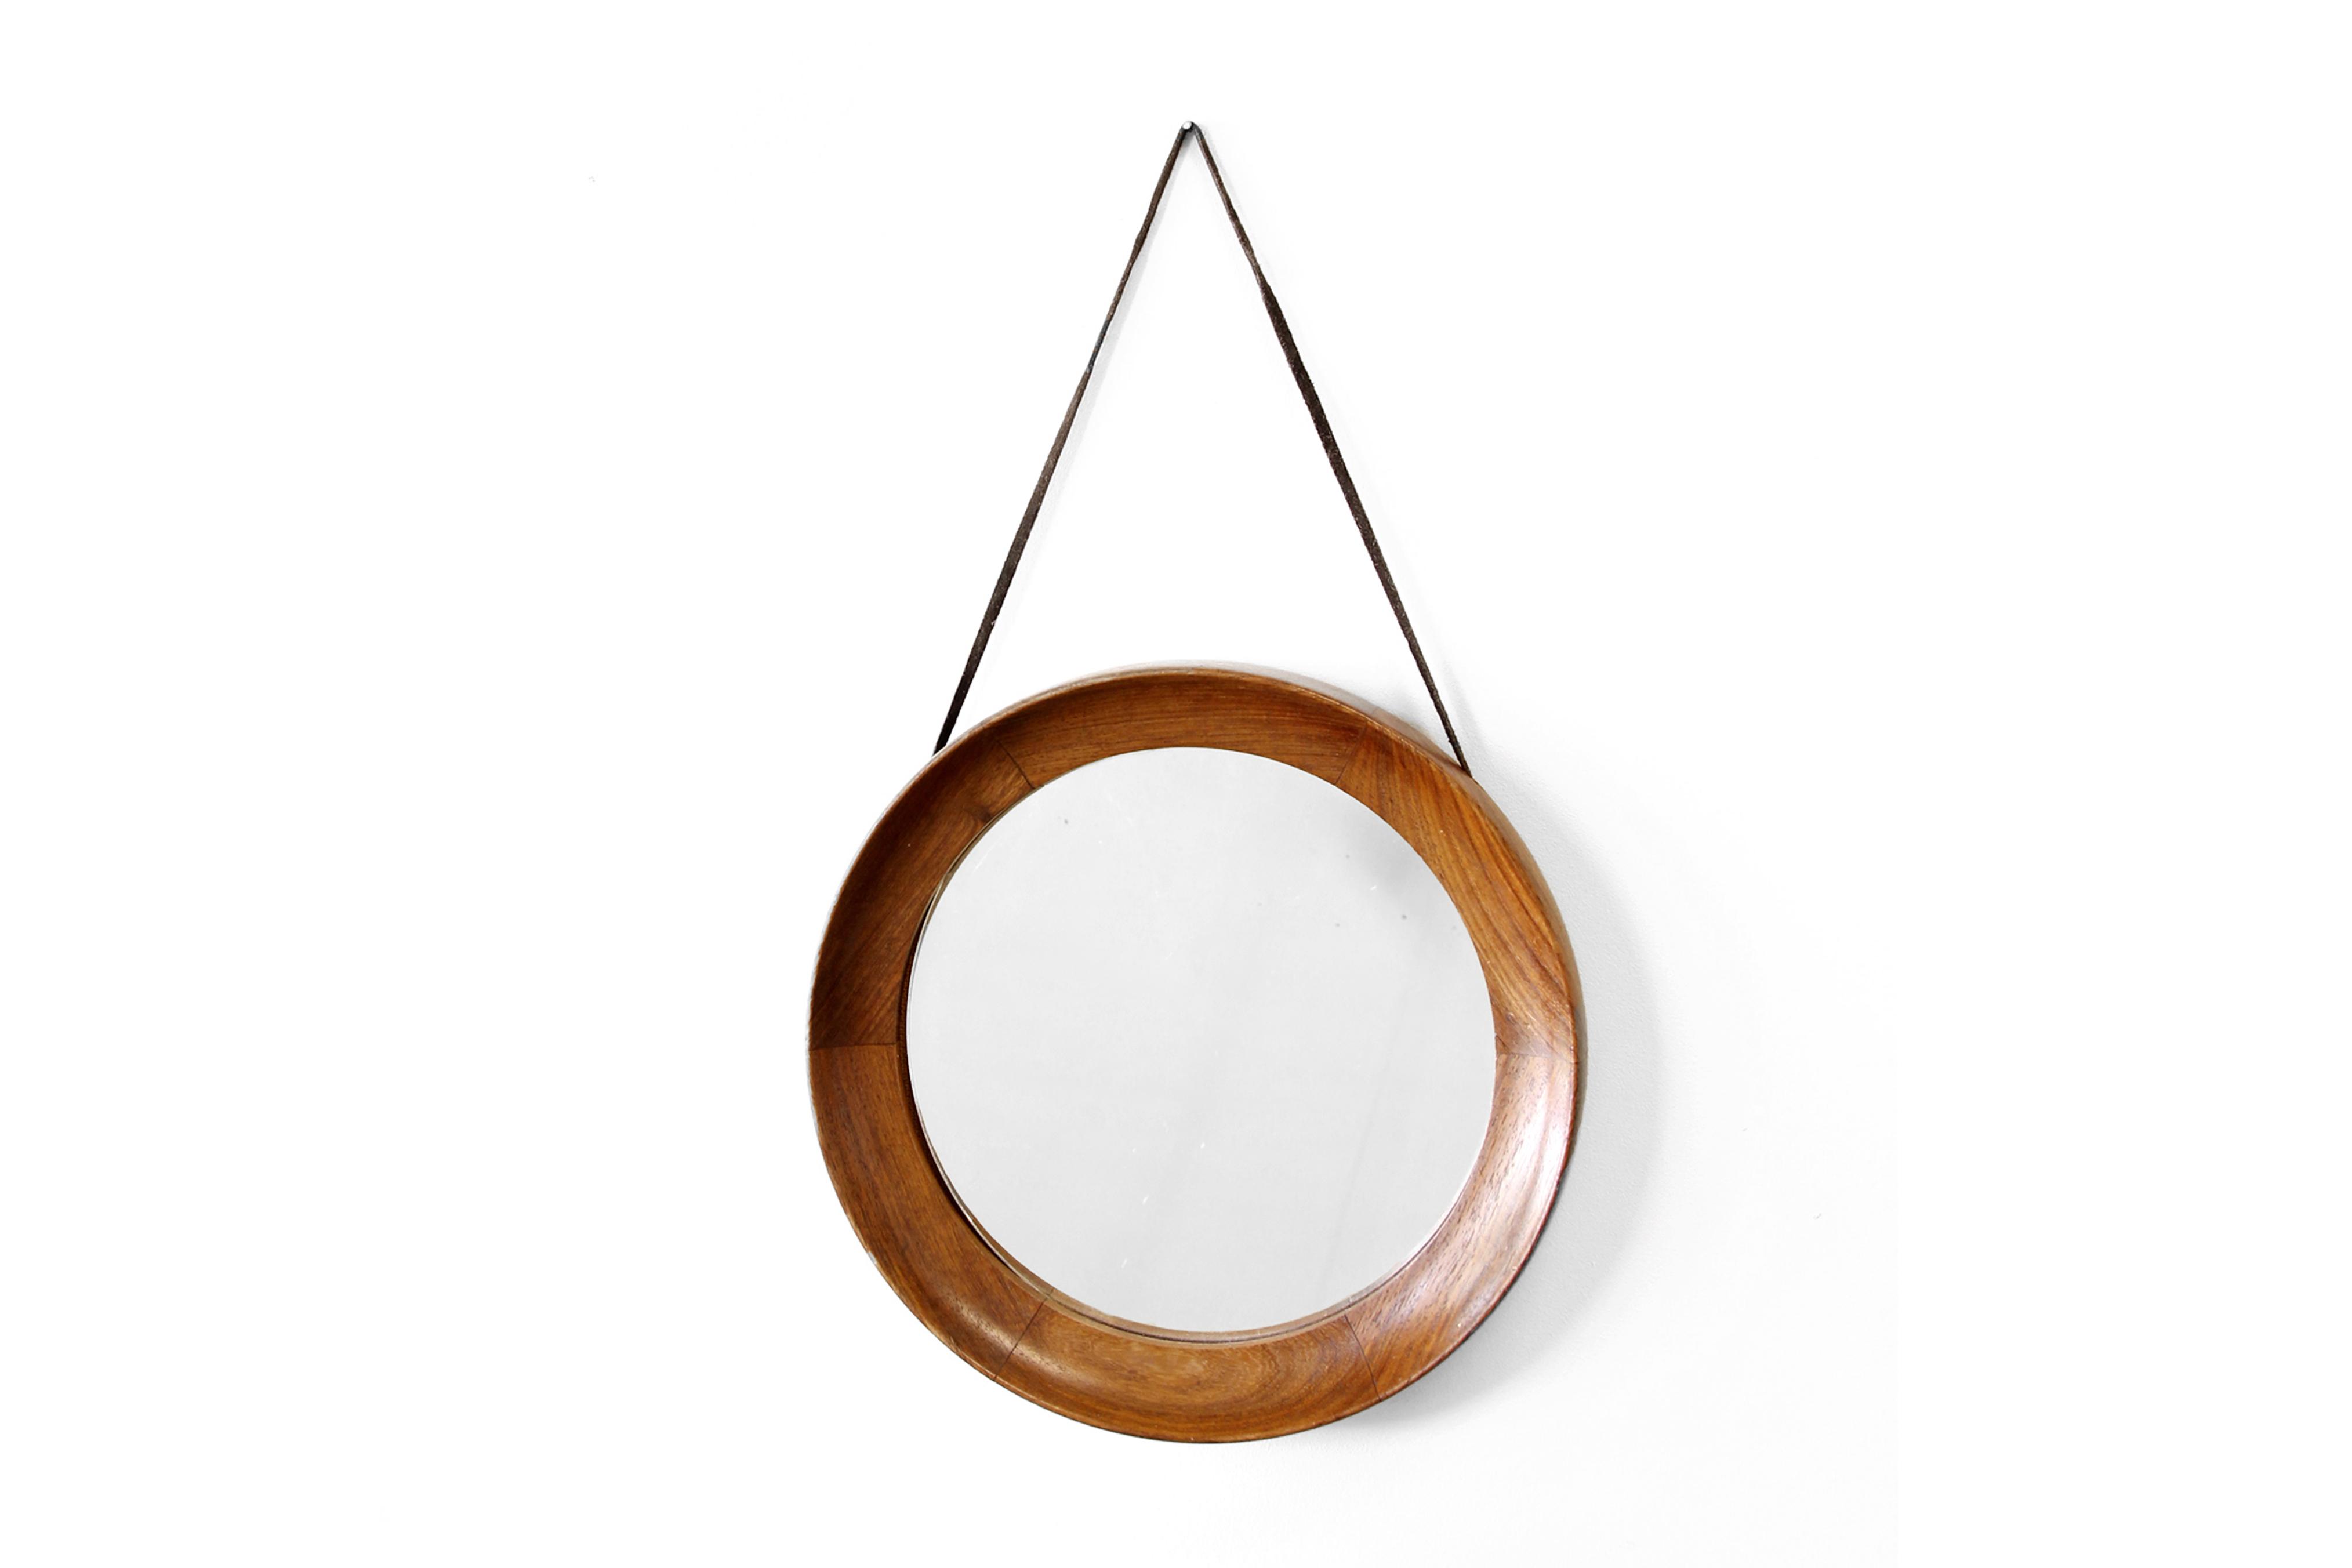 Ronde Houten Spiegel : Groot assortiment spiegels rond of ovaal barokspiegel